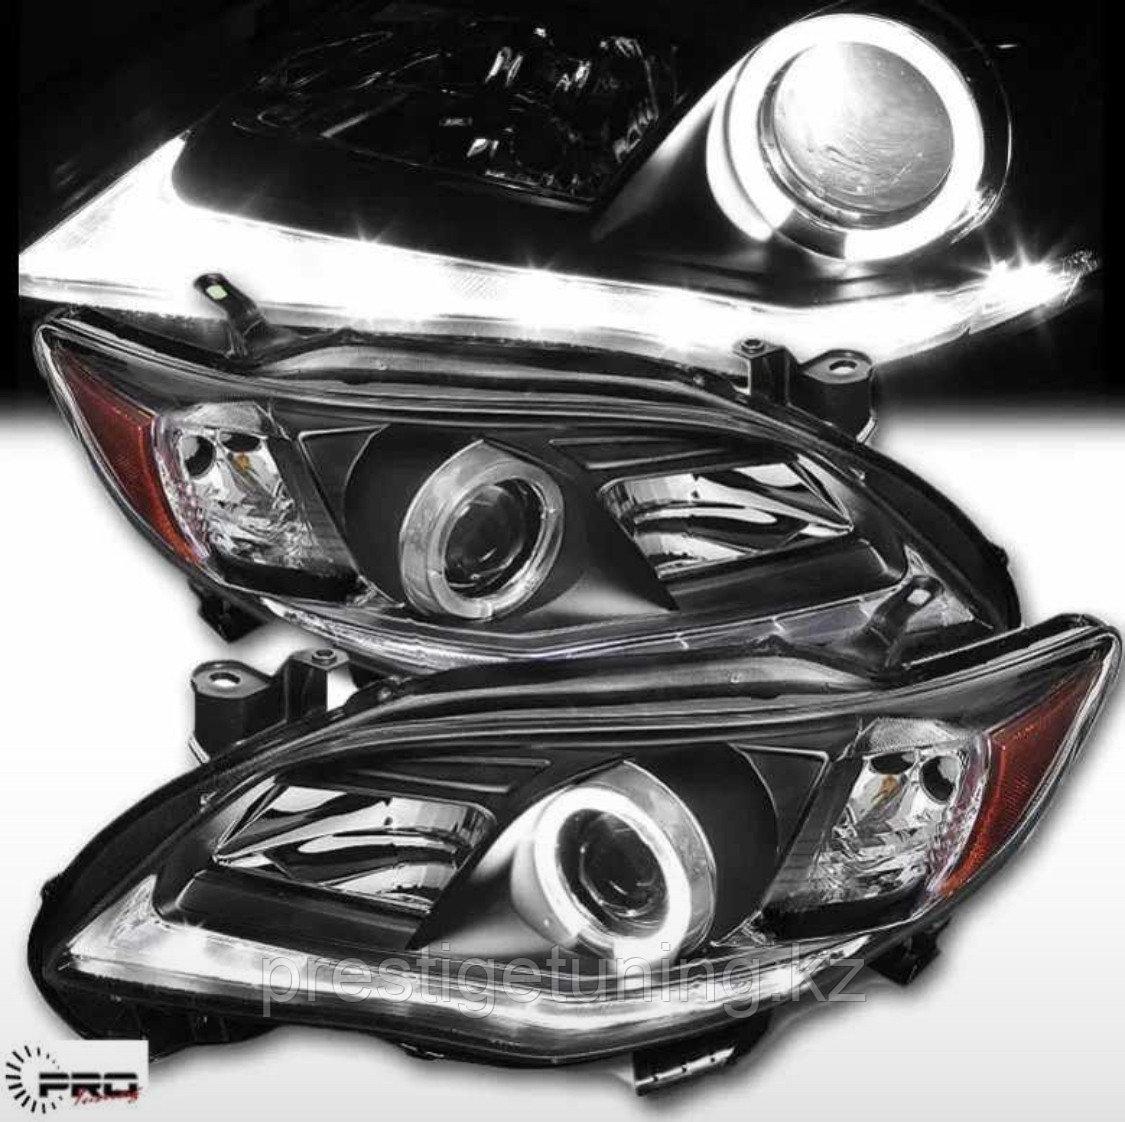 Передние фары на Toyota Corolla 2010-13 дизайн Angel Black color